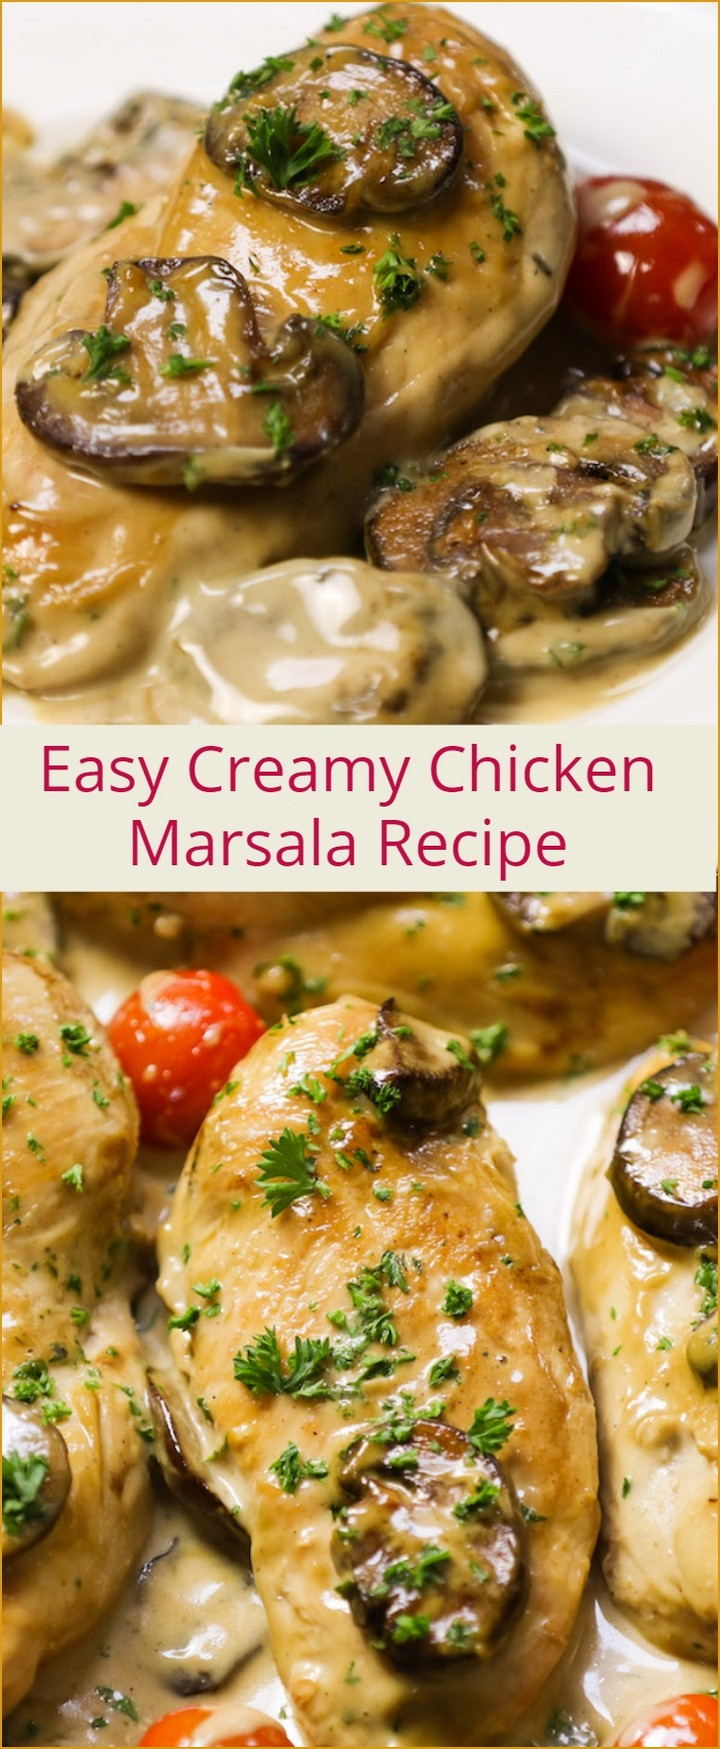 Creamy Chicken Marsala Recipe 1 1